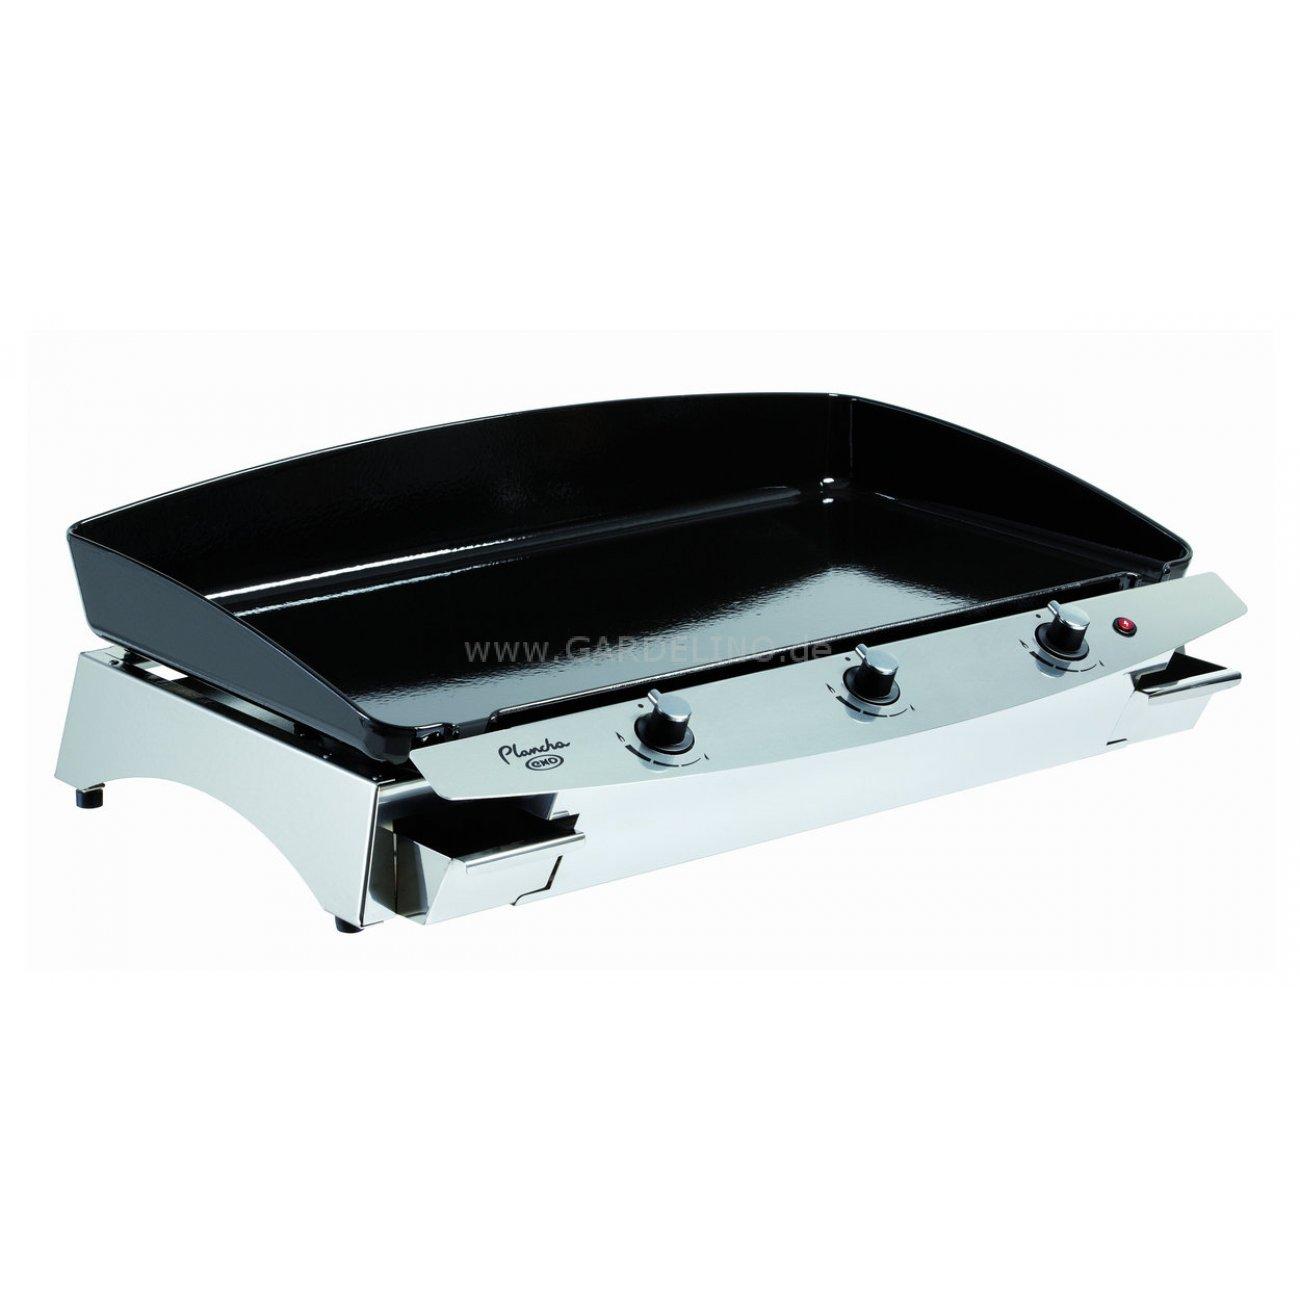 Plancha grill 75 von eno mit gas - Plancha exterieur electrique ...